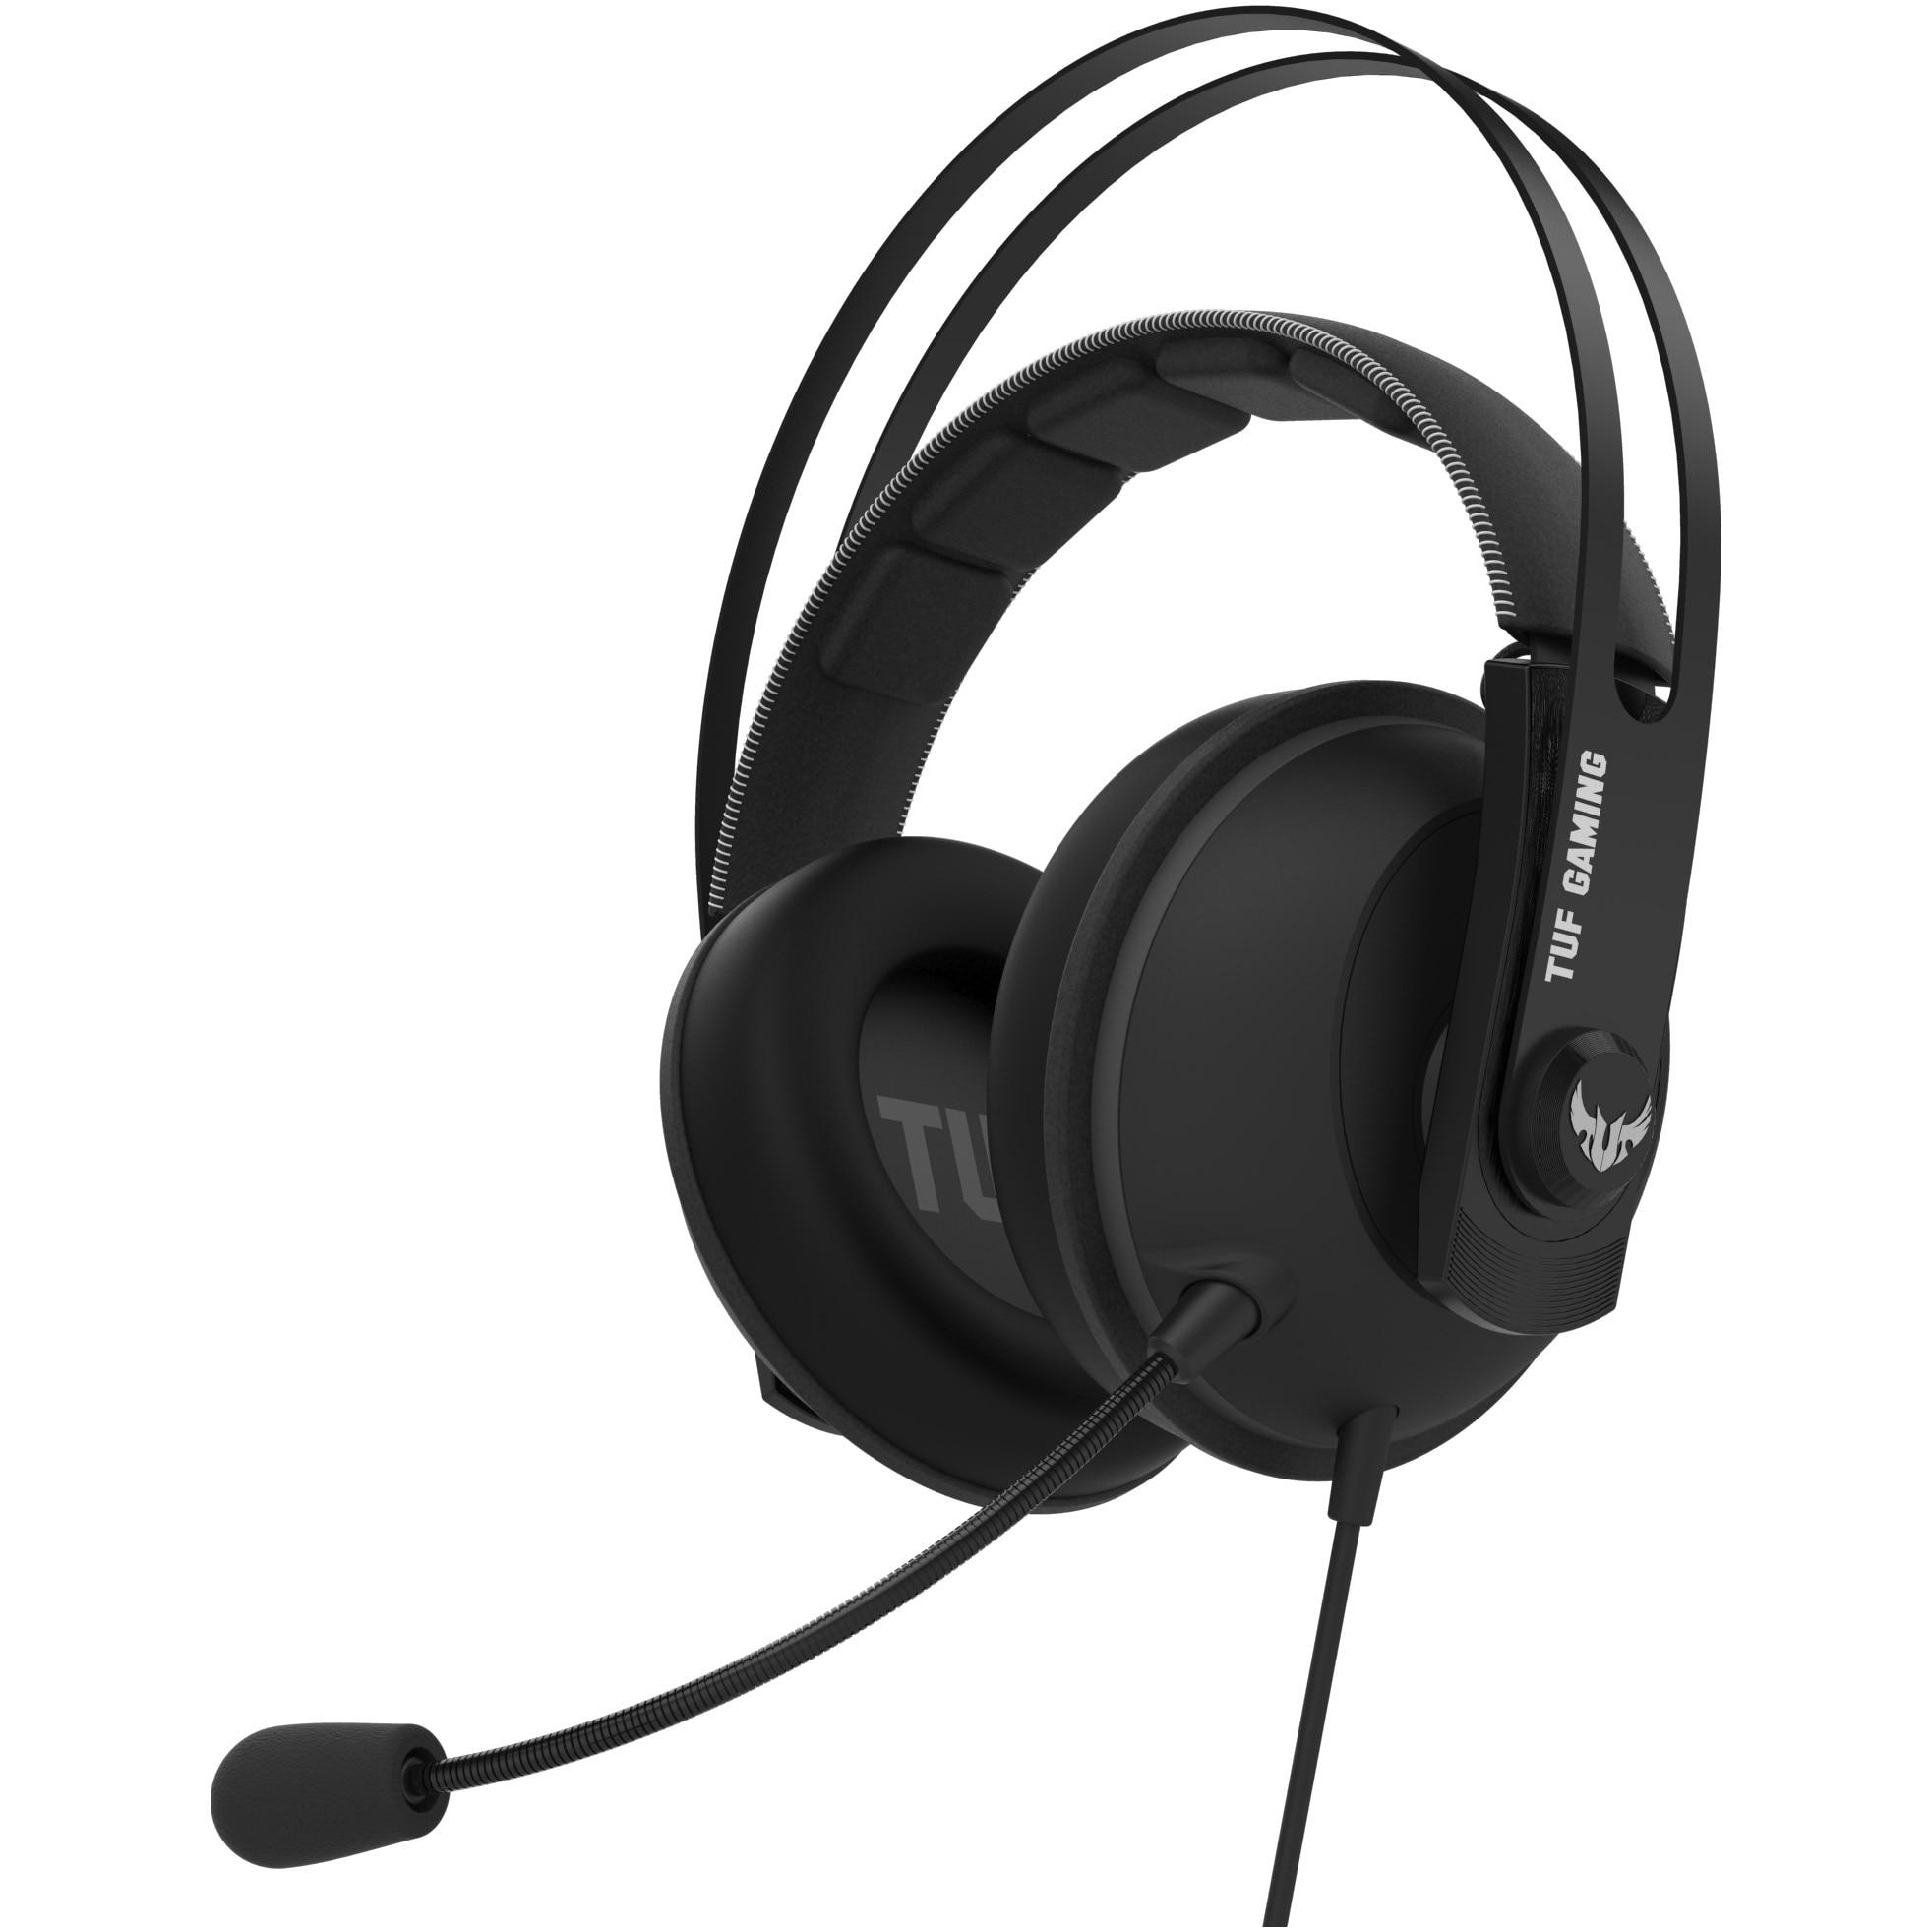 Fotografie Casti gaming ASUS TUF Gaming H7, sunet surround virtual 7.1, procesor audio USB hardware, difuzoare 53mm, banda de sustinere din otel inoxidabil, compatibile multiplatforma, 3.5mm/USB 2.0, Gun Metal